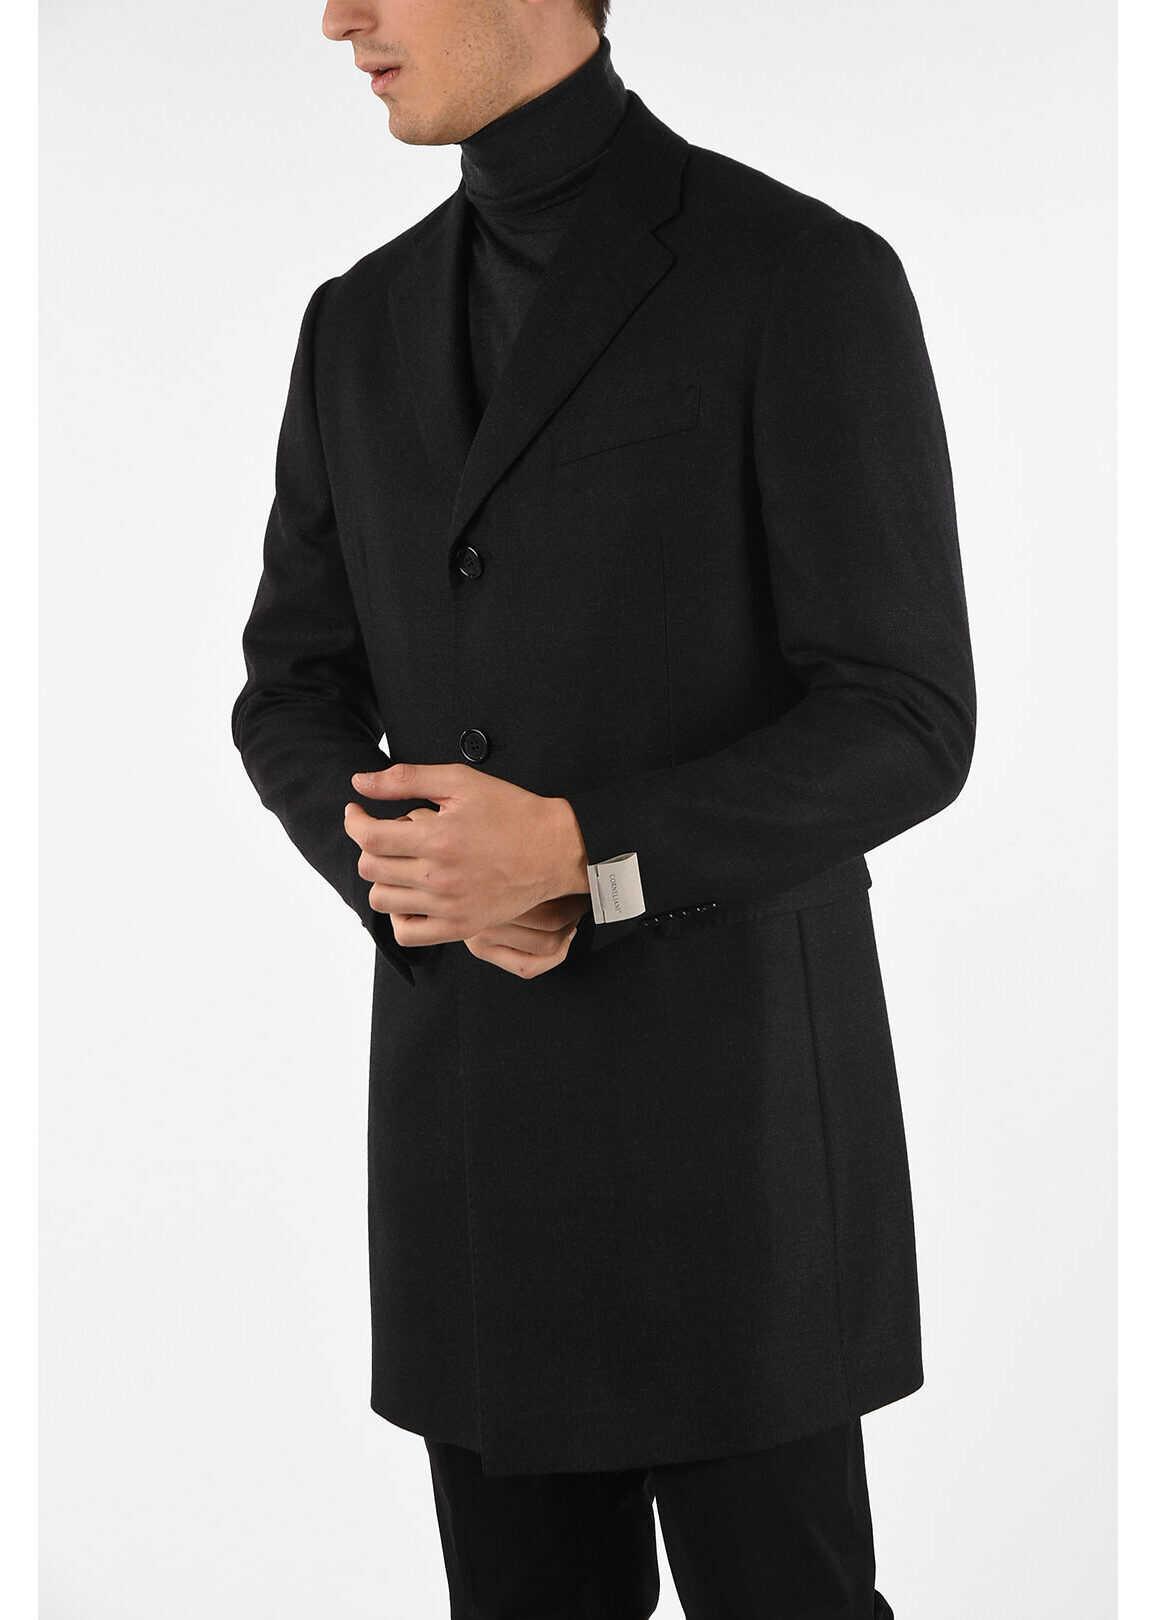 CORNELIANI three-quarter length 3-button coat GRAY imagine